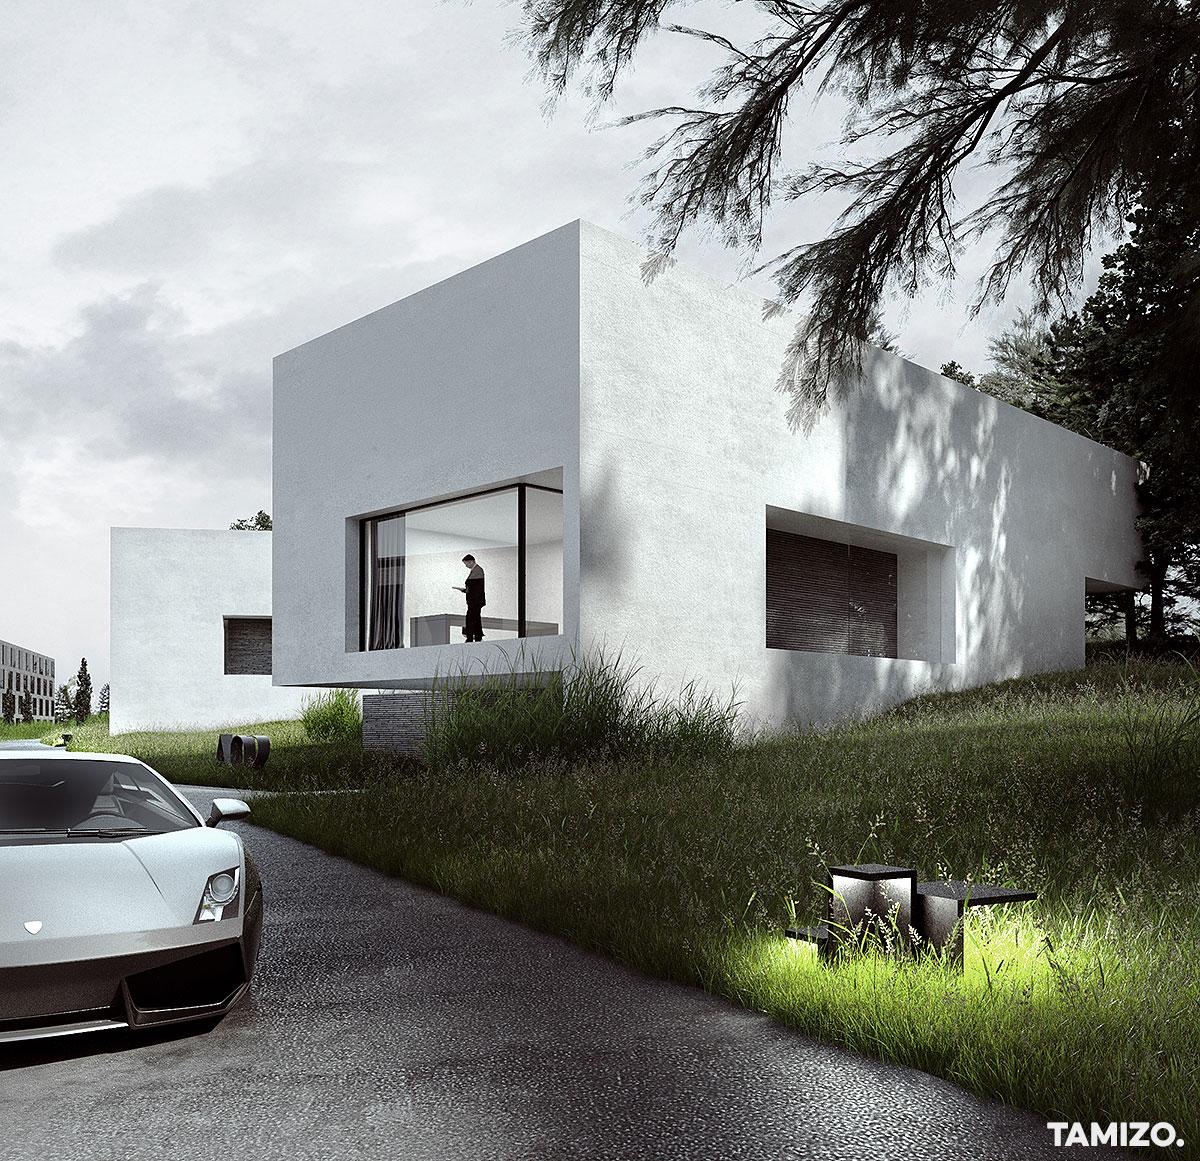 A061_tamizo_architects_competition_tbilisi_georgia_multifamily_houseing_realestate_04